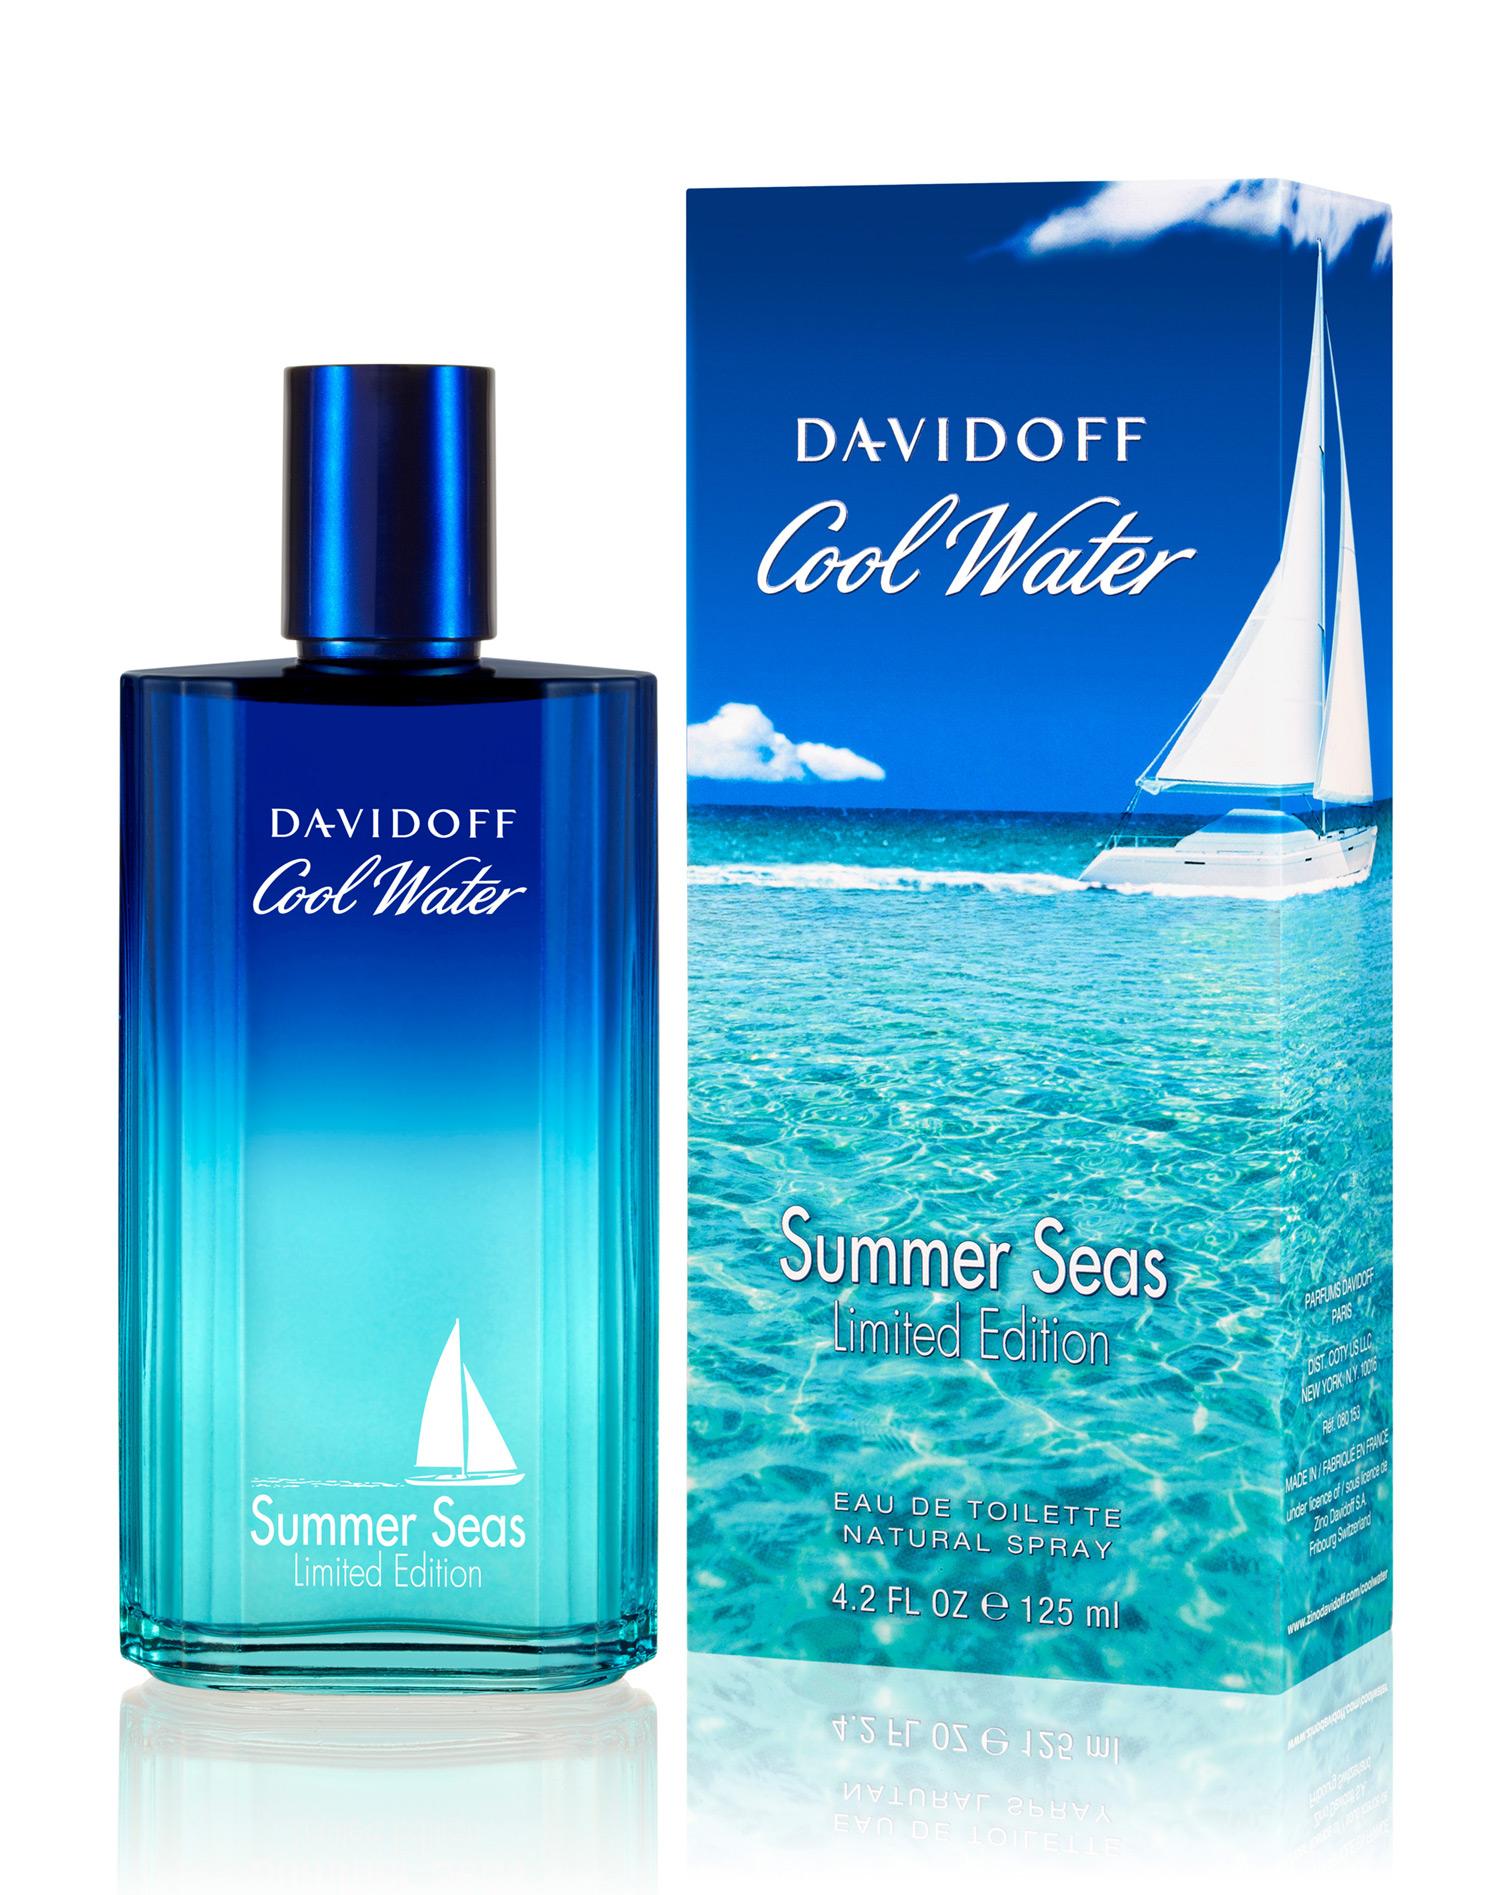 b8fb81e5779 Cool Water Man Summer Seas Davidoff cologne - a fragrance for men 2015